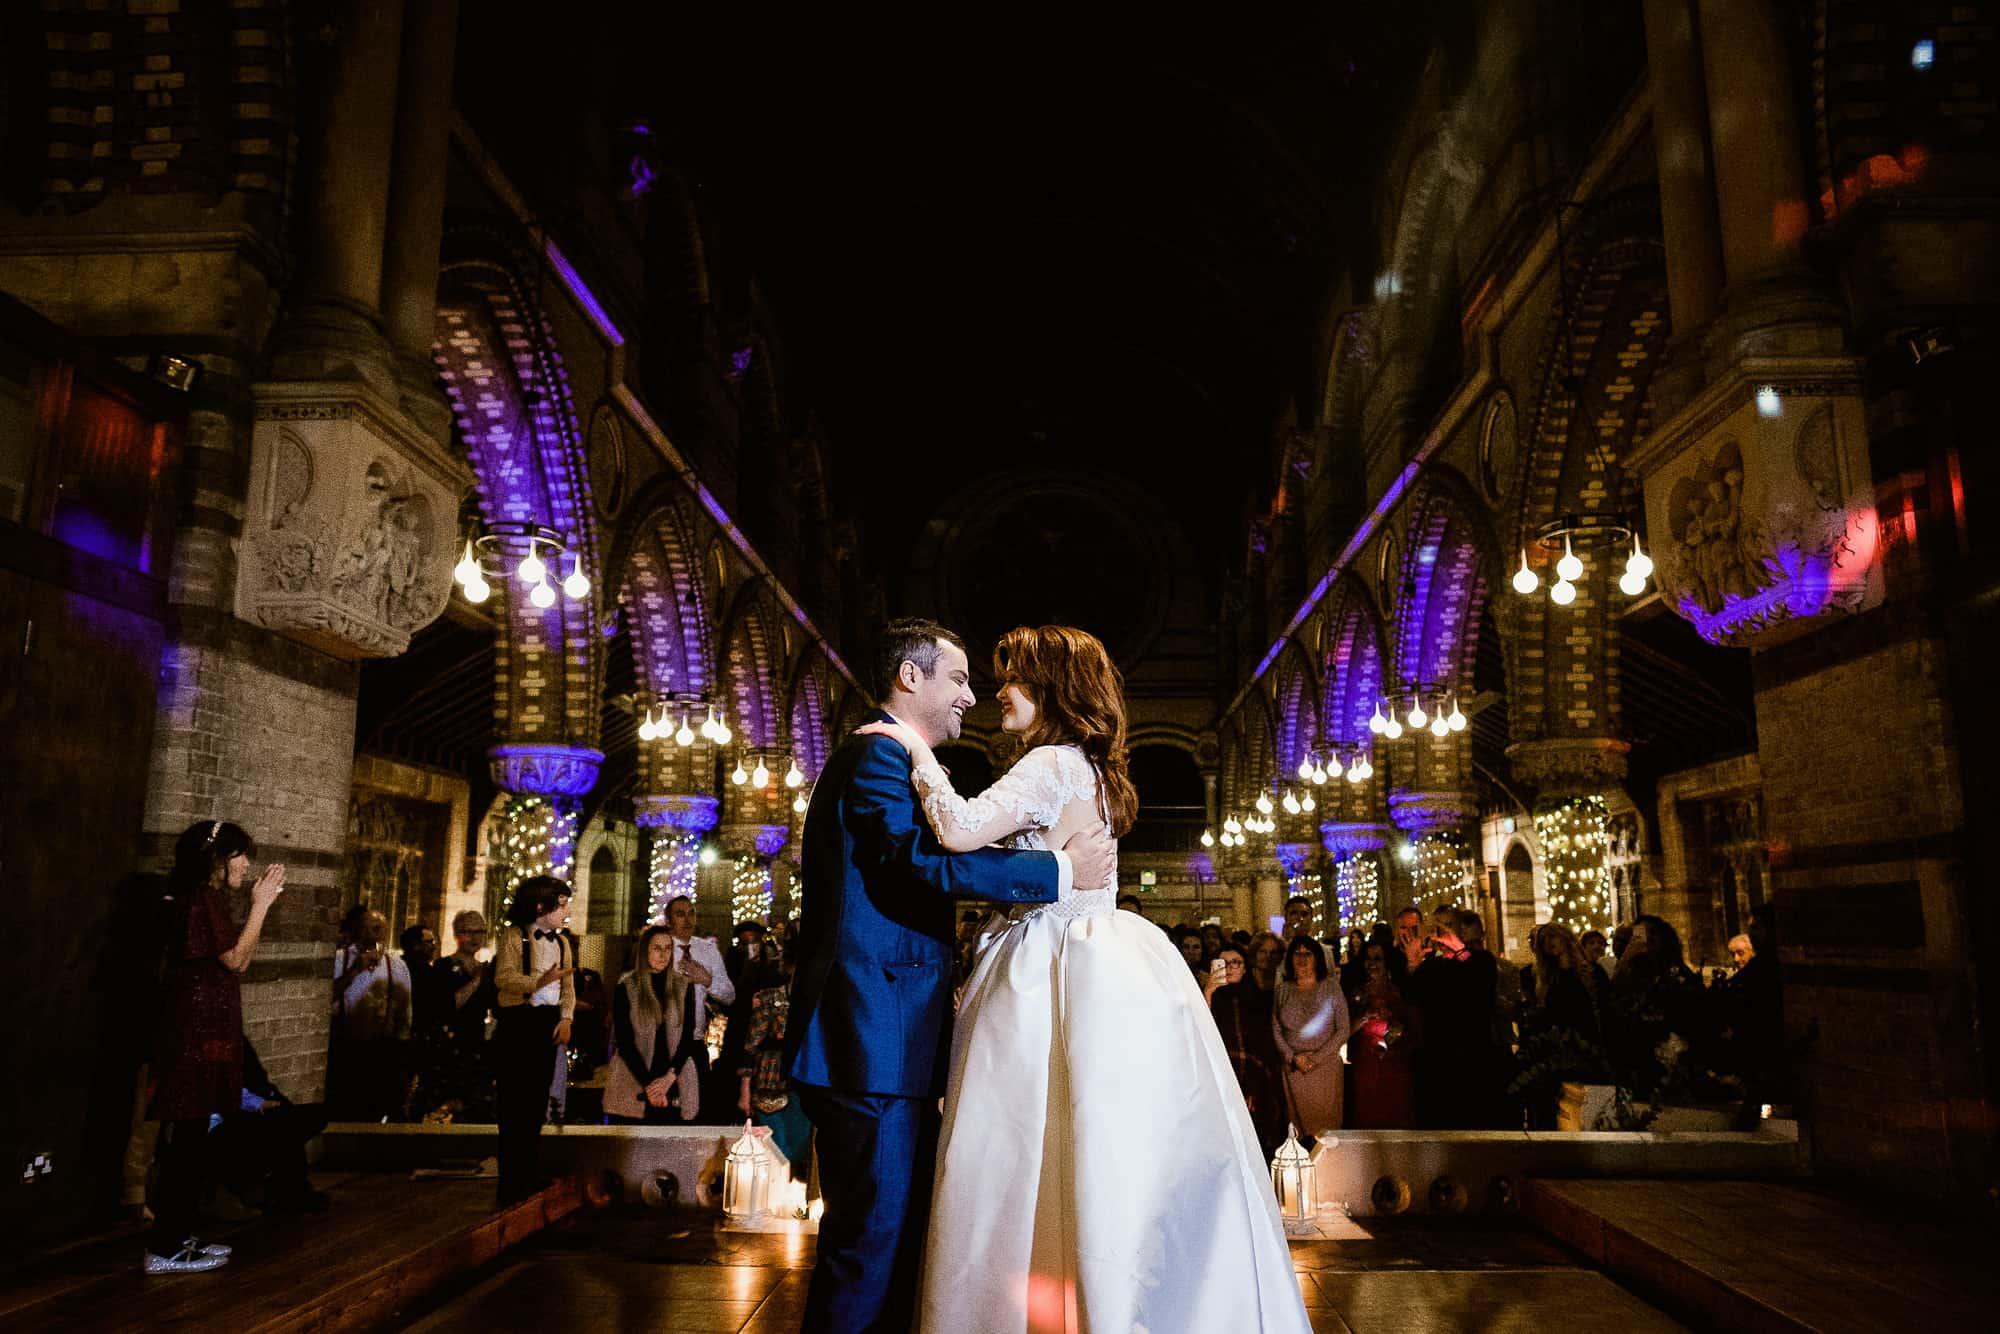 st-stephens-wedding-photographer-matt-tyler-0049